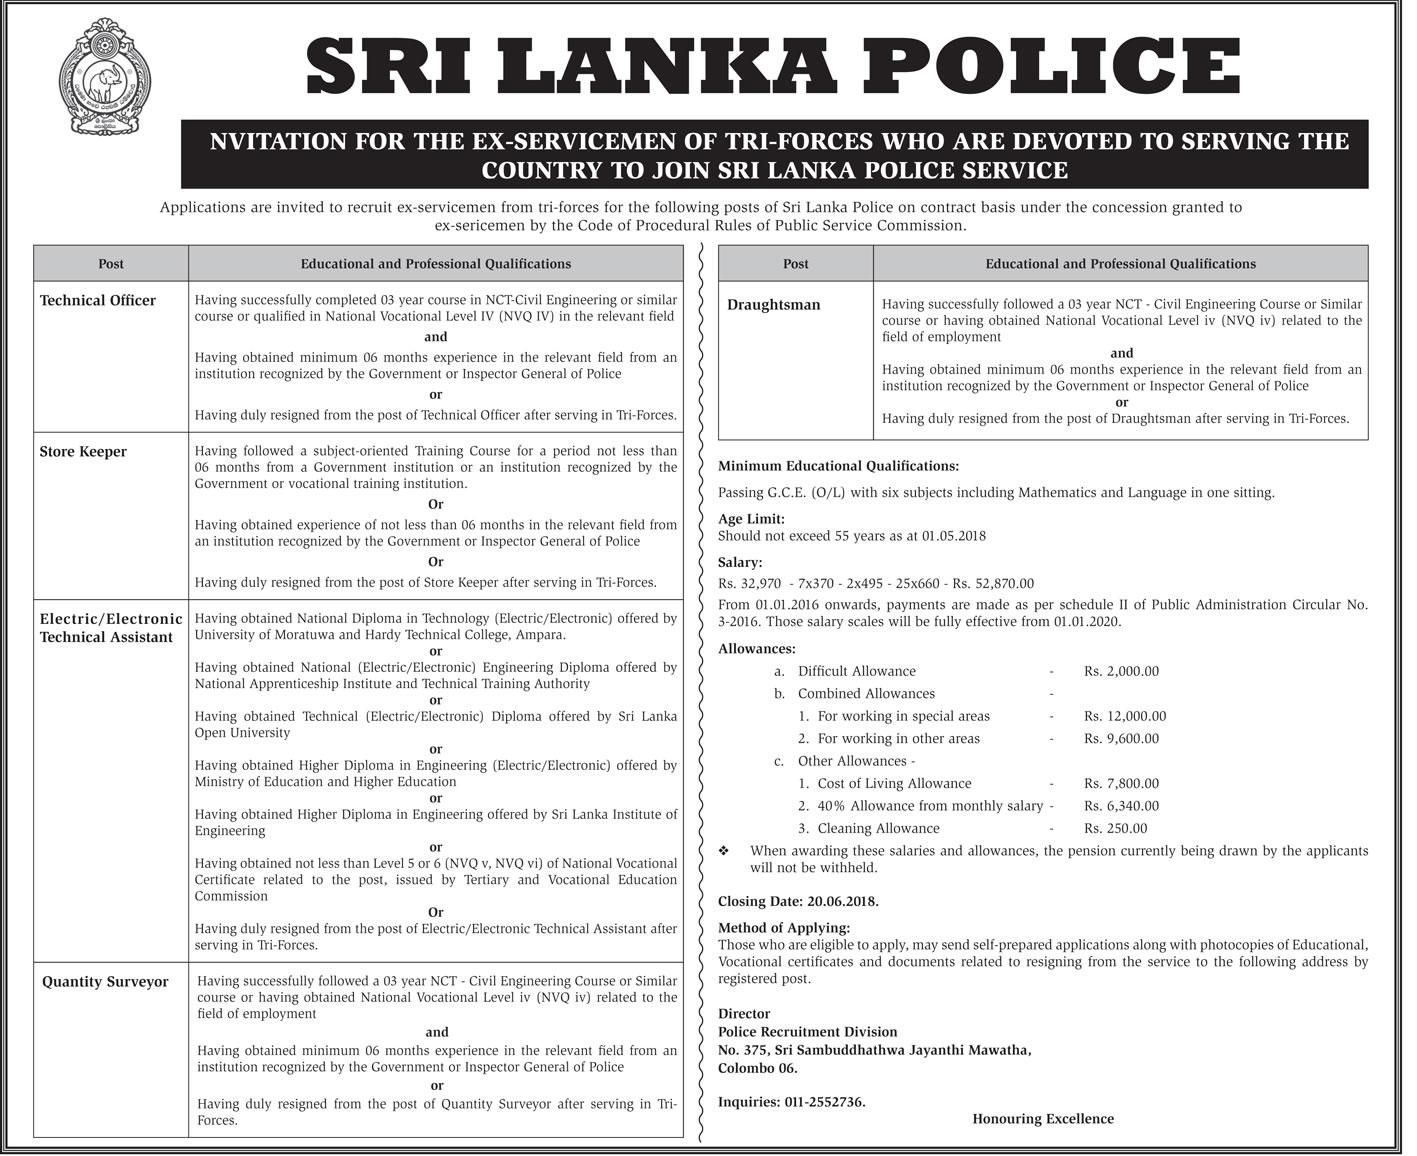 SRI LANKA POLICE VACANCIES for Technical Officer